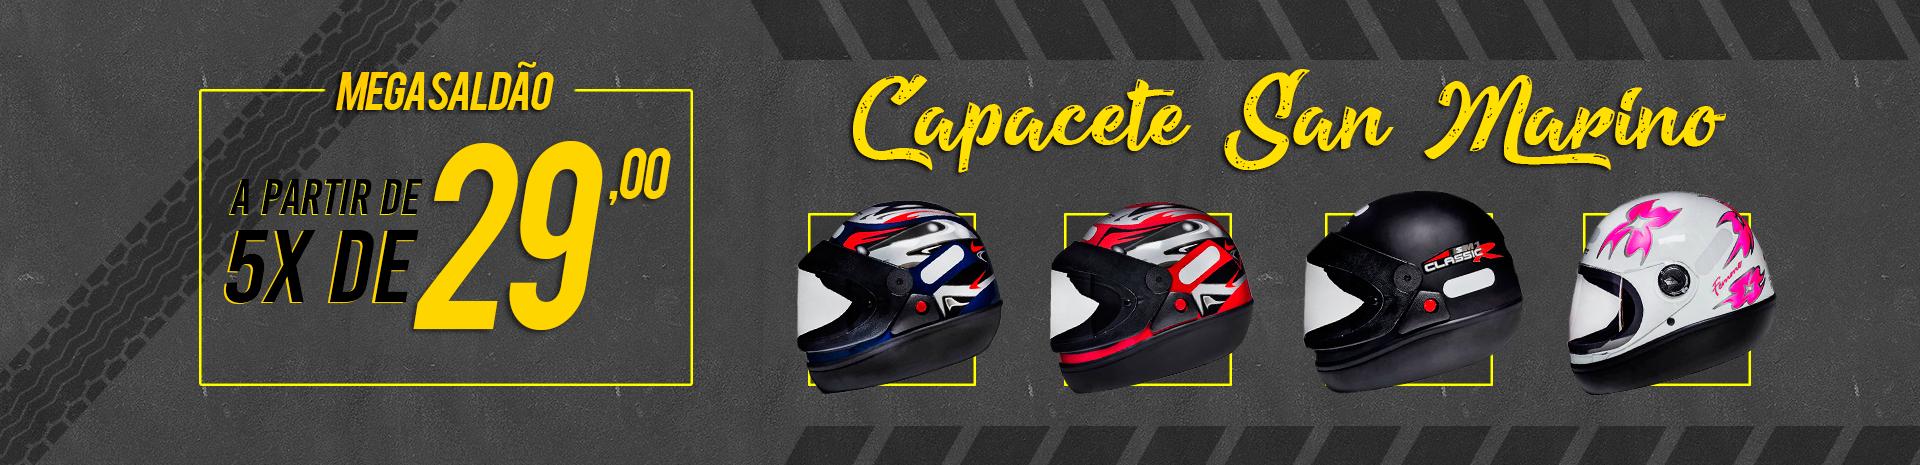 capacete san marino 5x de 29,00